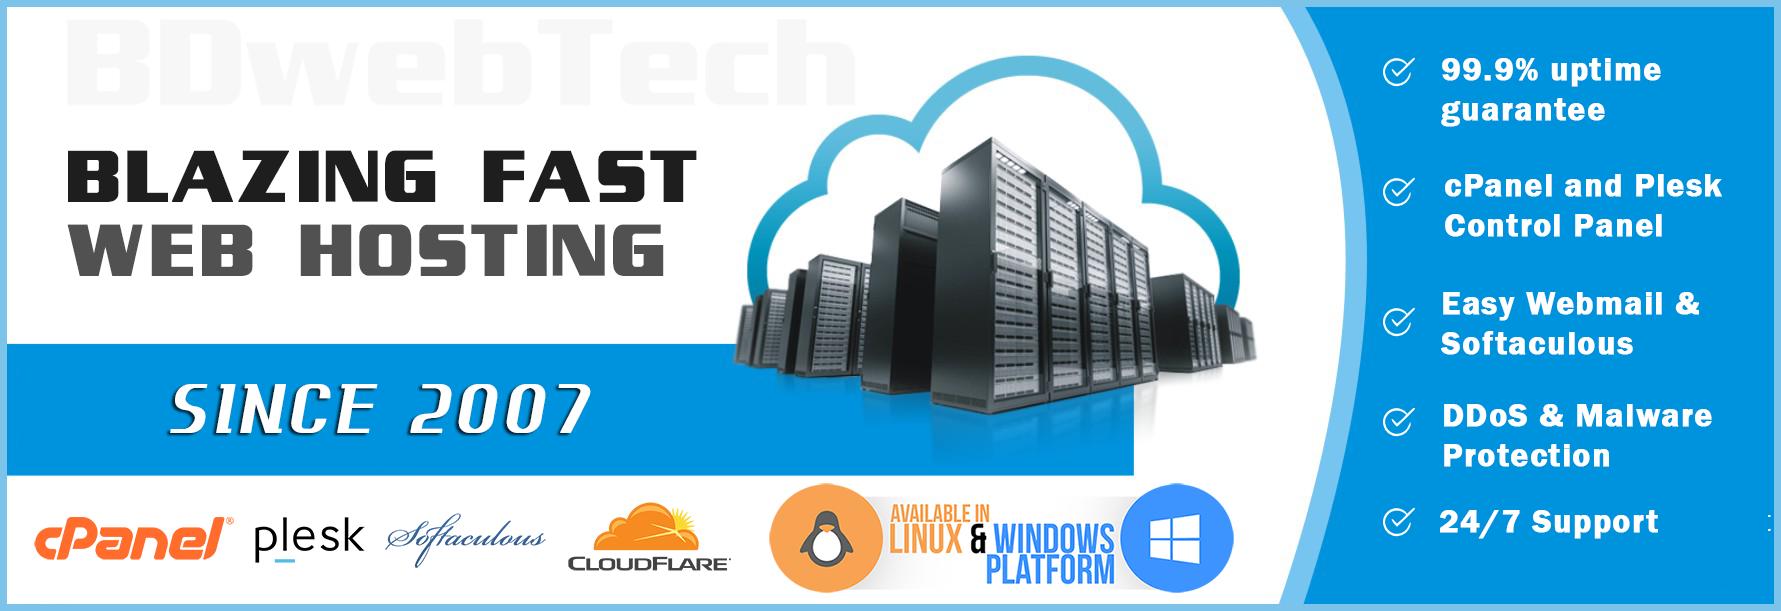 bdwebtech web hosting banner